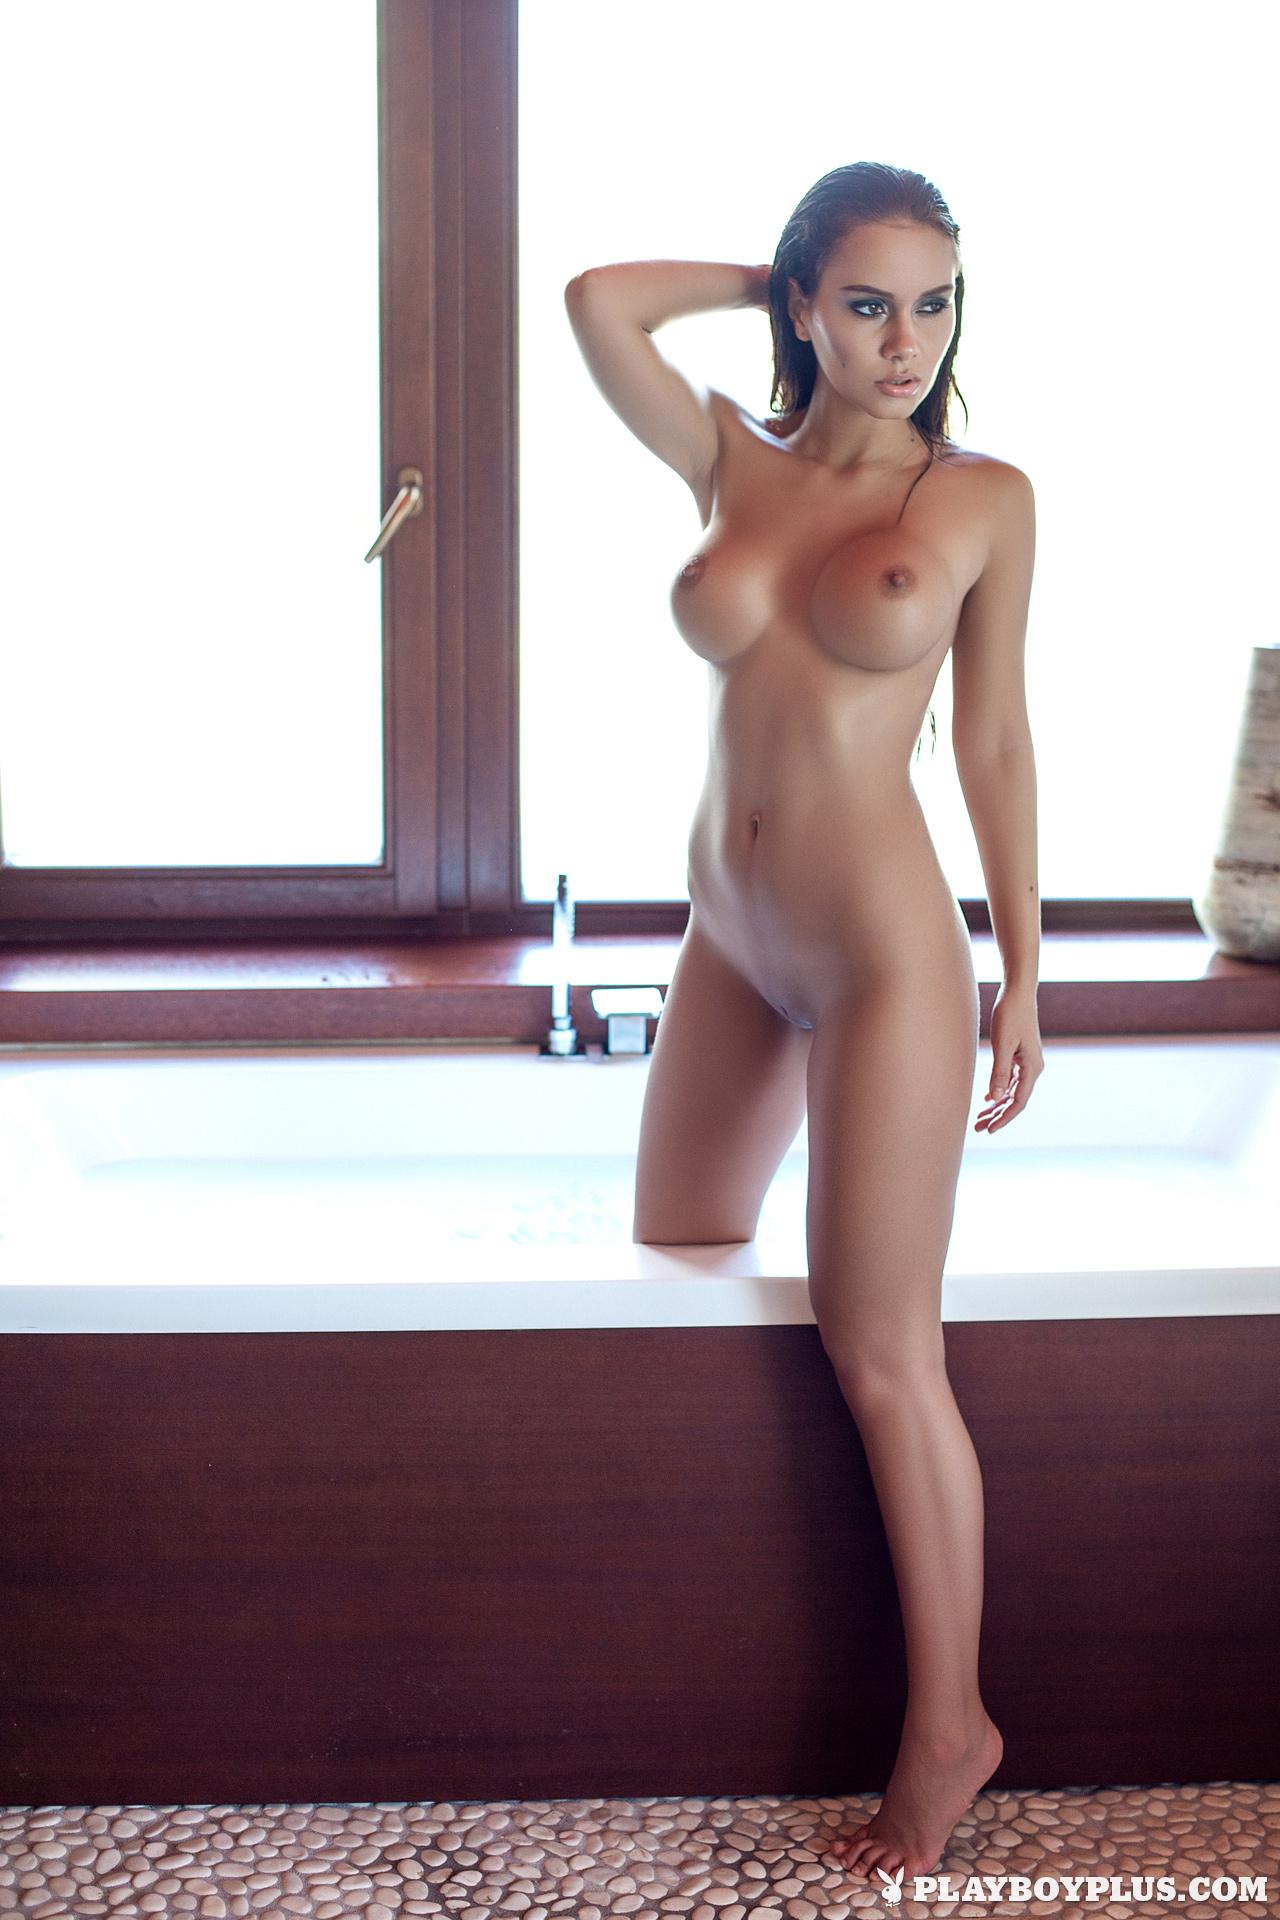 Porn clubstunning brunette pics pornos vids